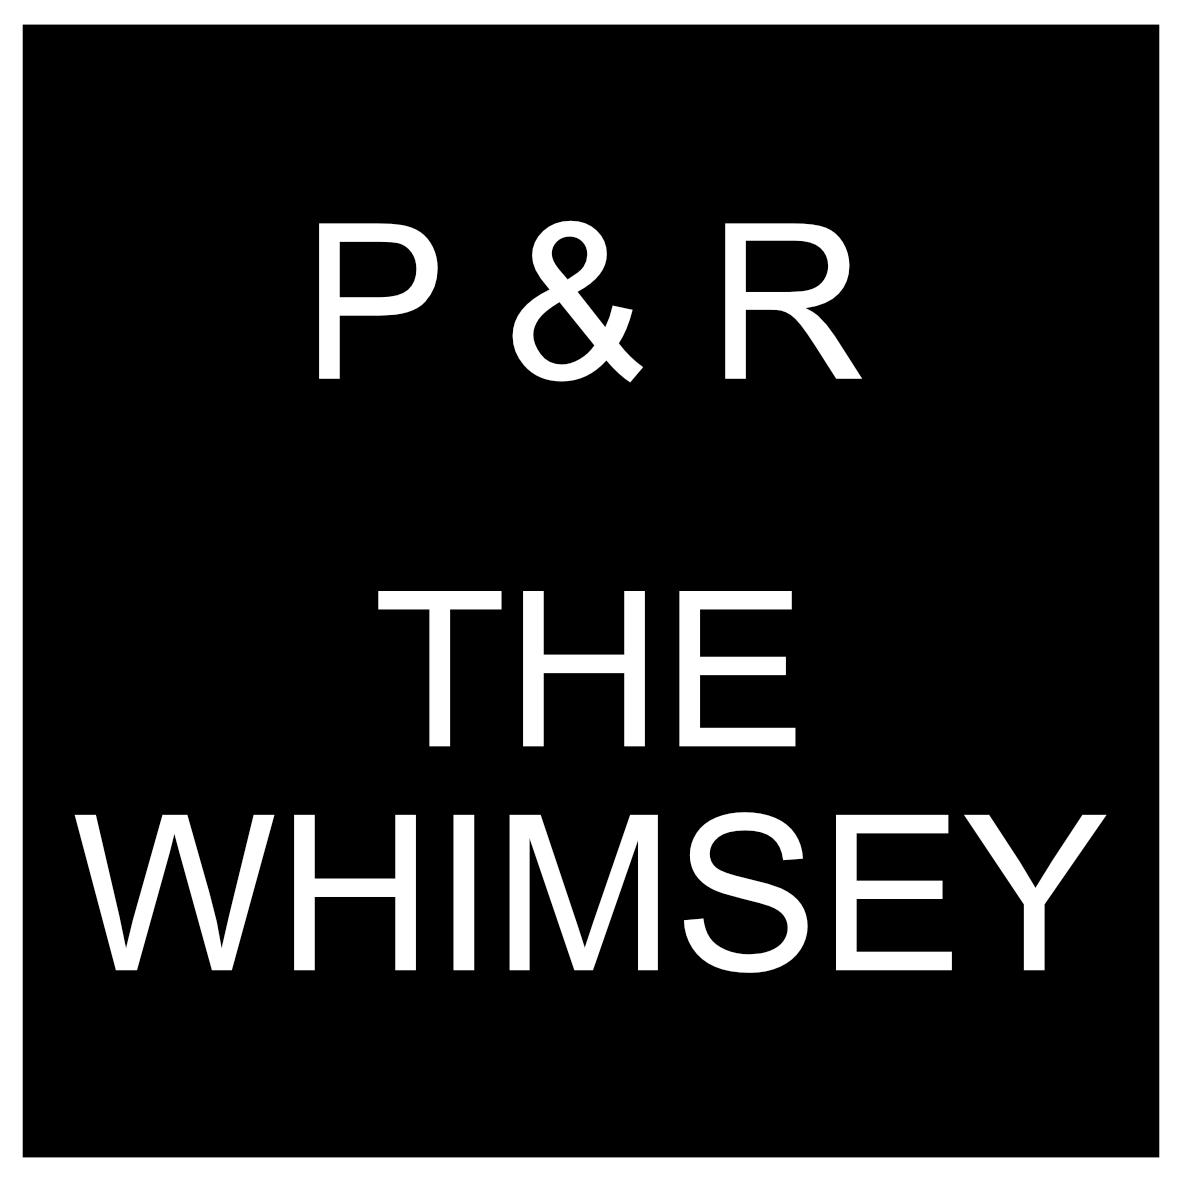 peteandrobsmusicalwhimsey.com